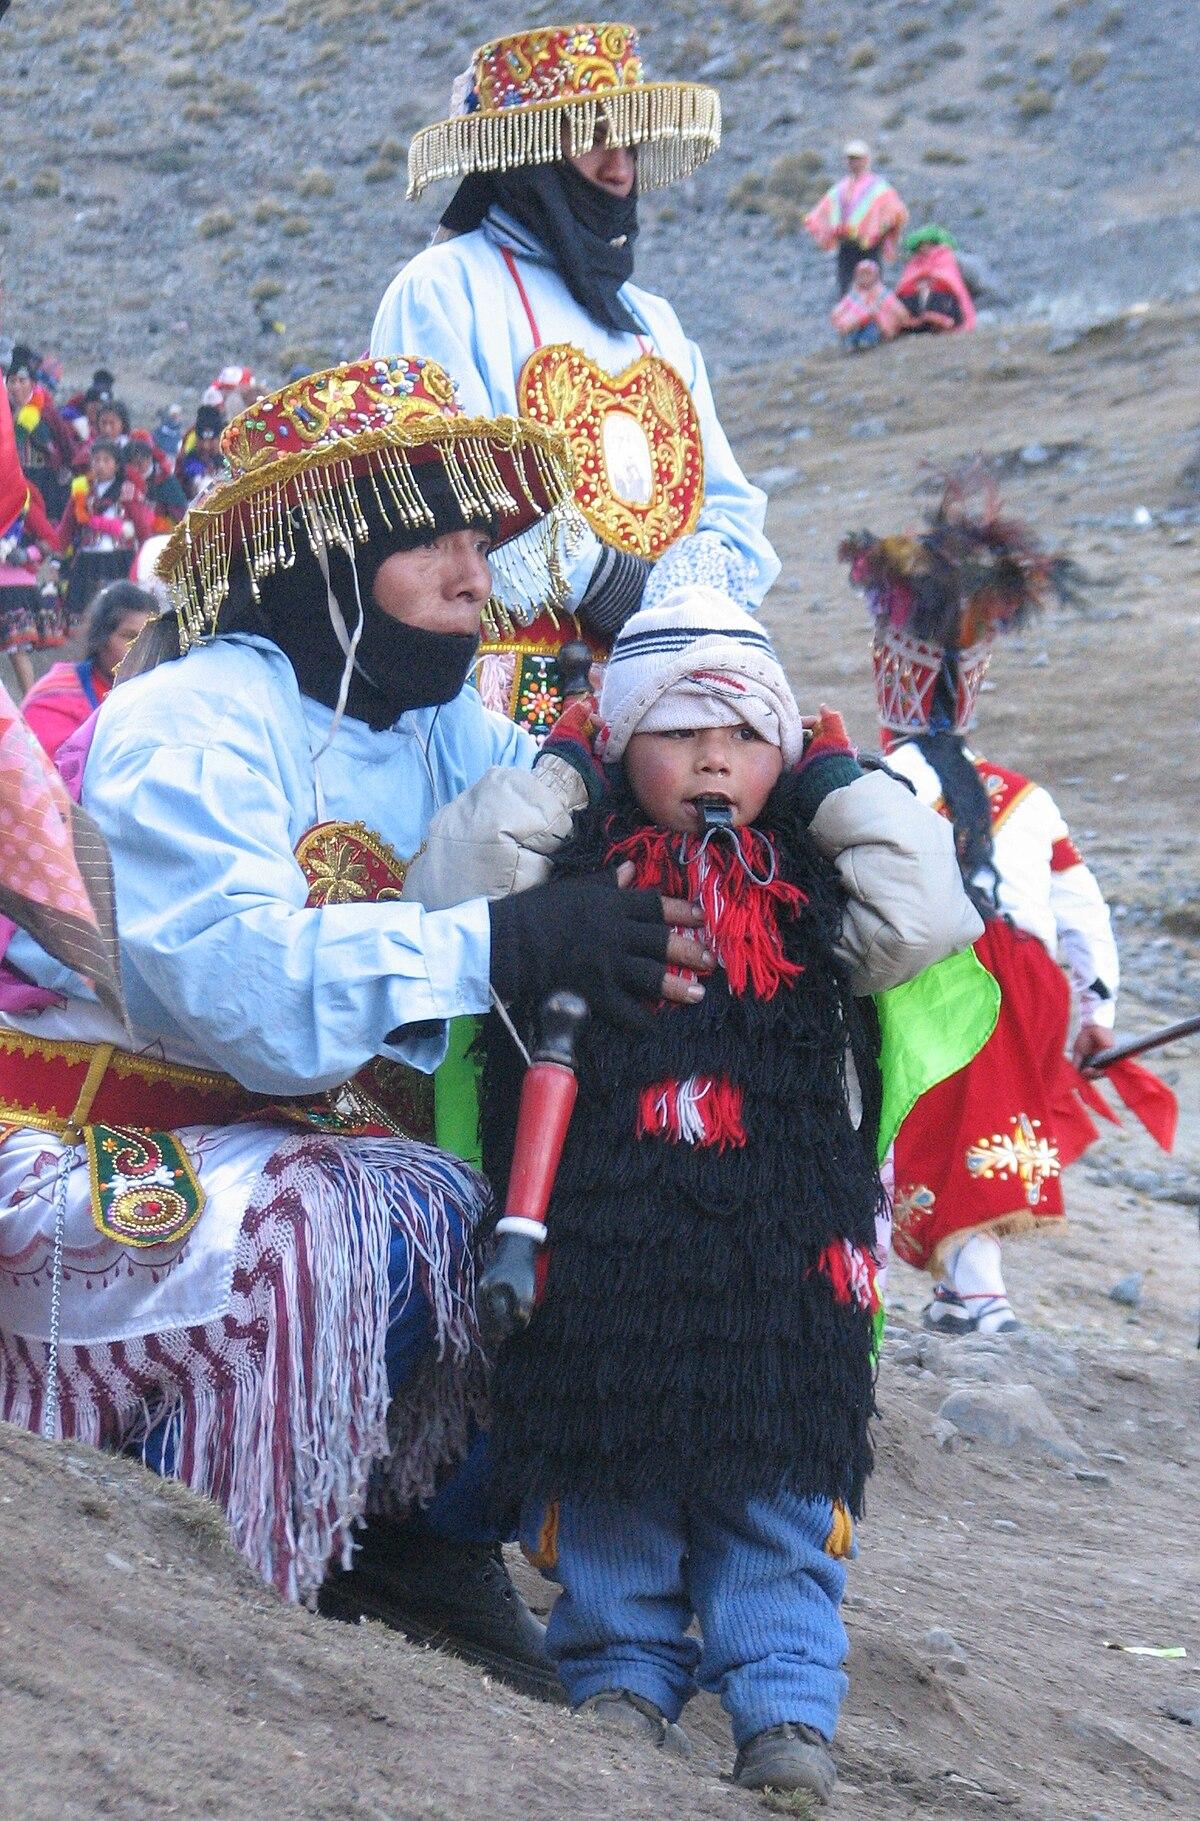 indigenous peoples in peru wikipedia